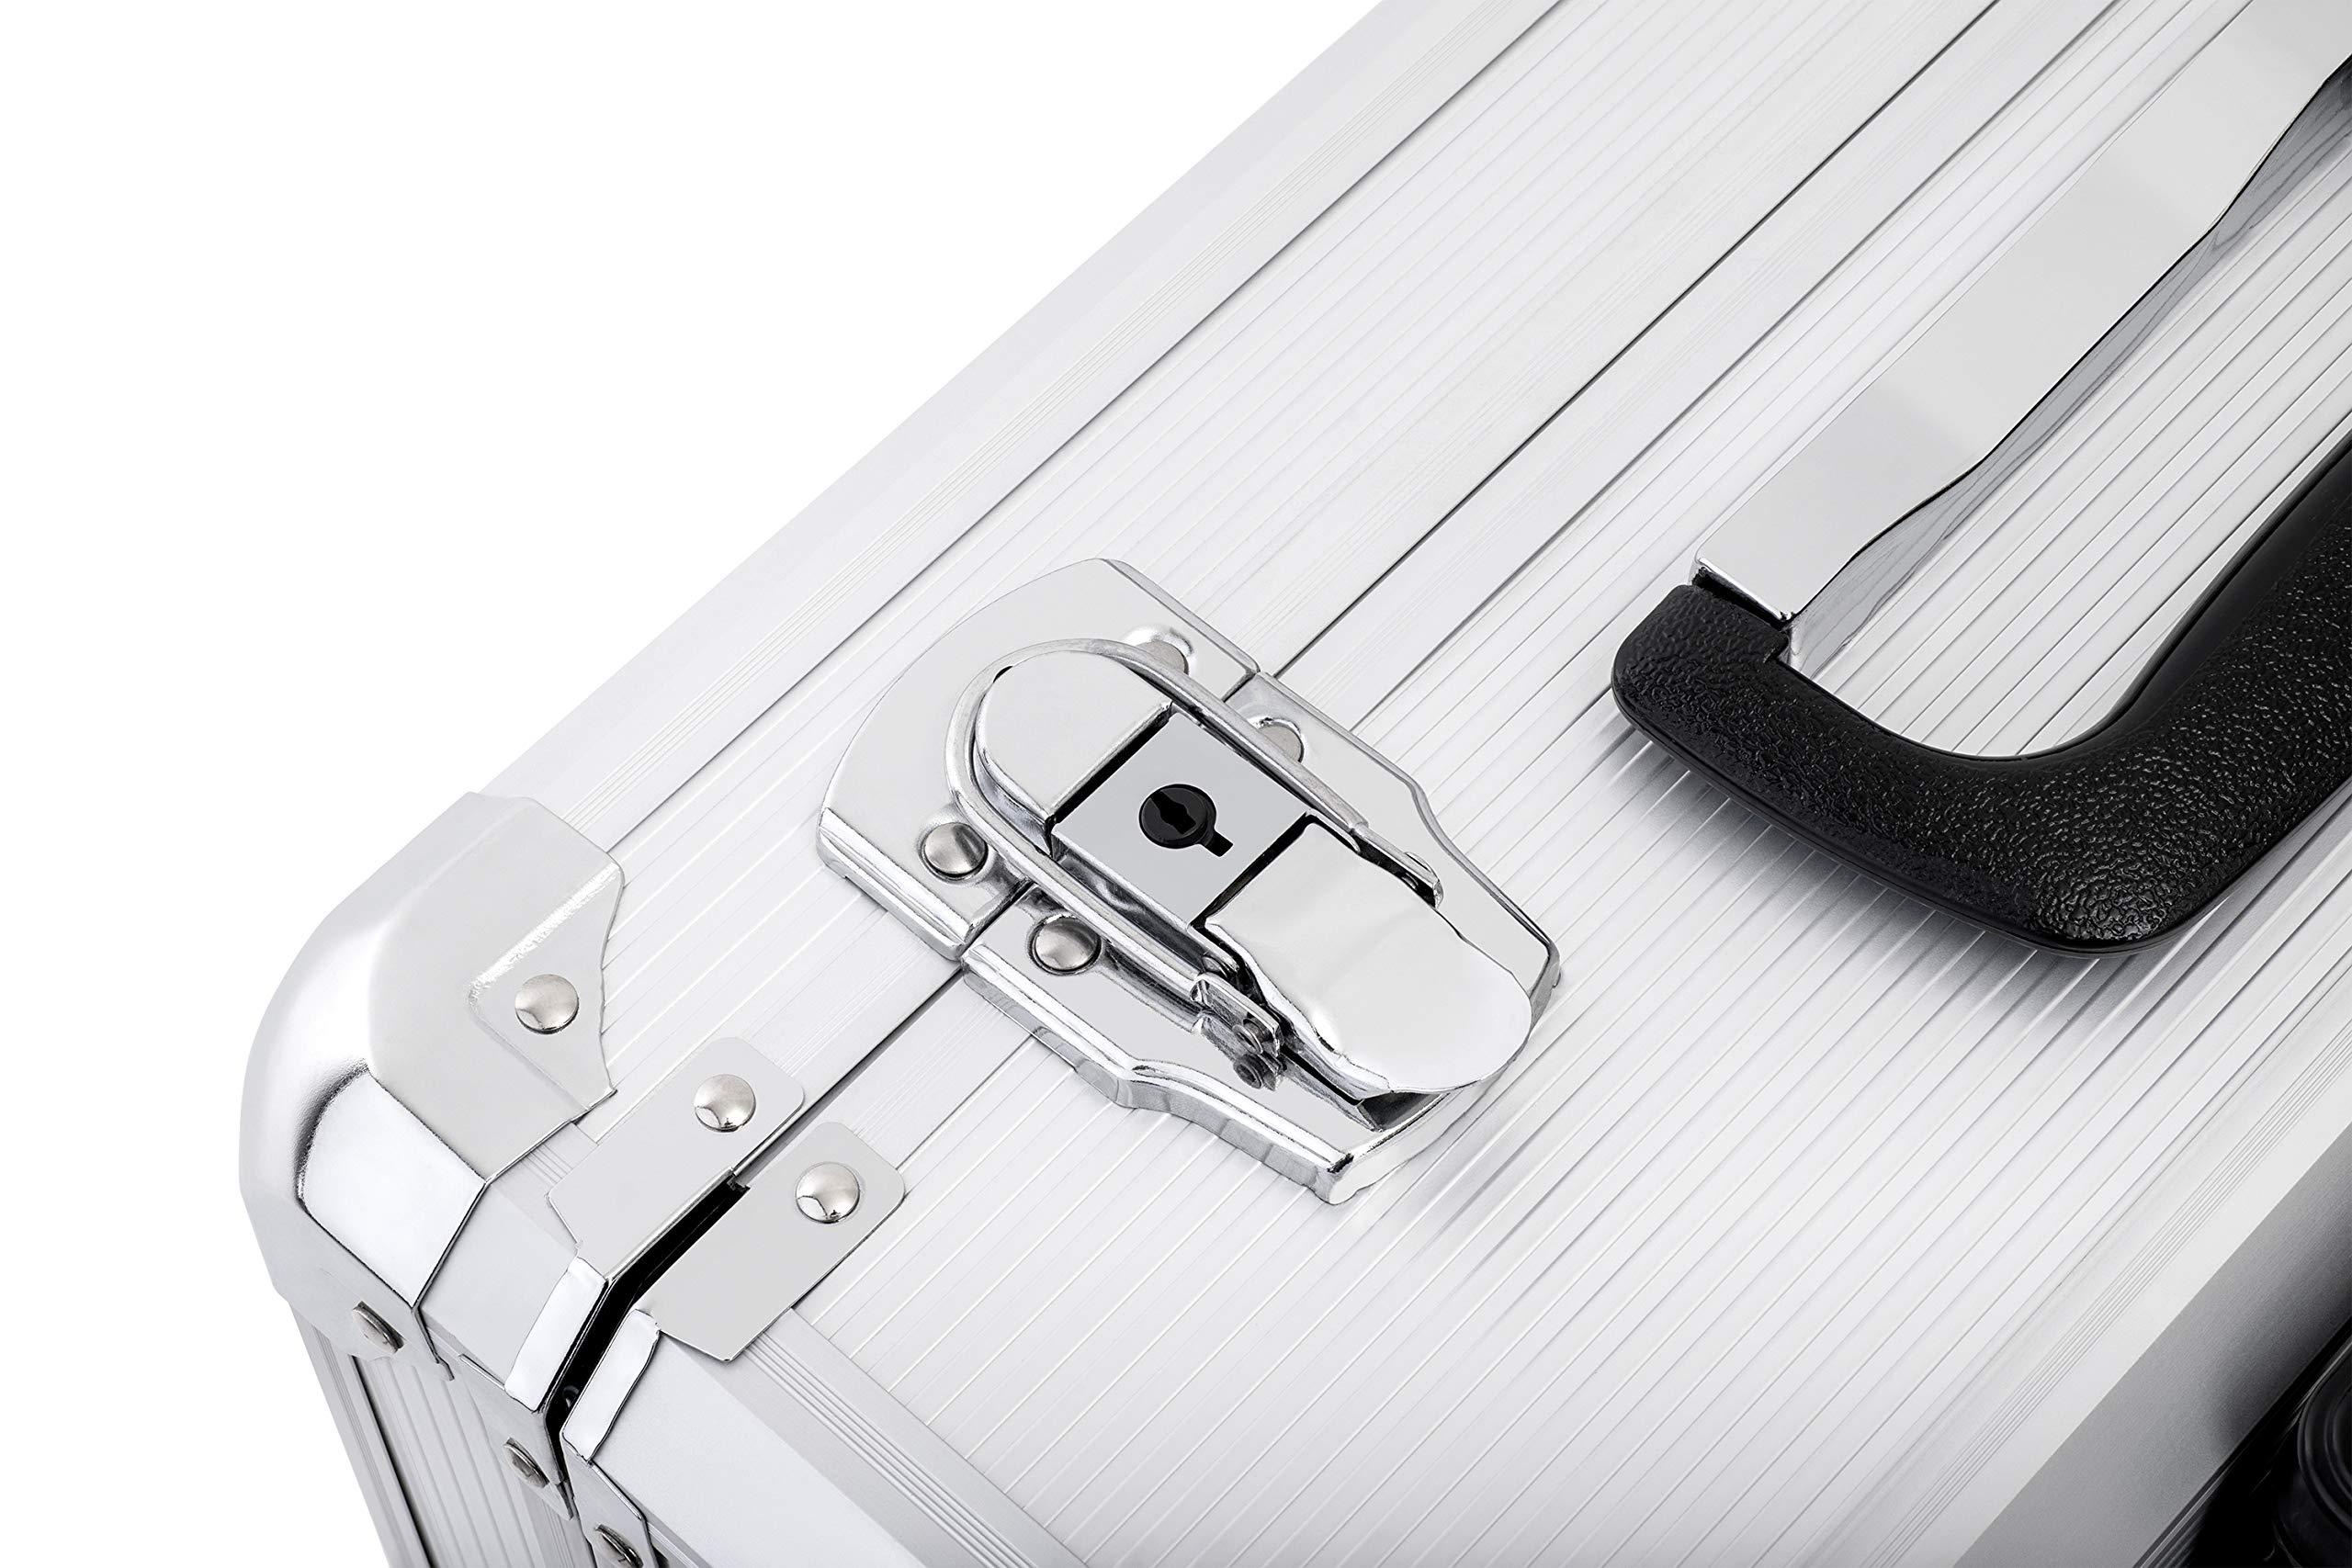 TRESKO-Valigia-degli-attrezzi-composta-da-949-pezzi-cassetta-degli-attrezzi-portaattrezzi-set-di-arnesi-trolley-degli-attrezzi-acciaio-cromo-vanadio